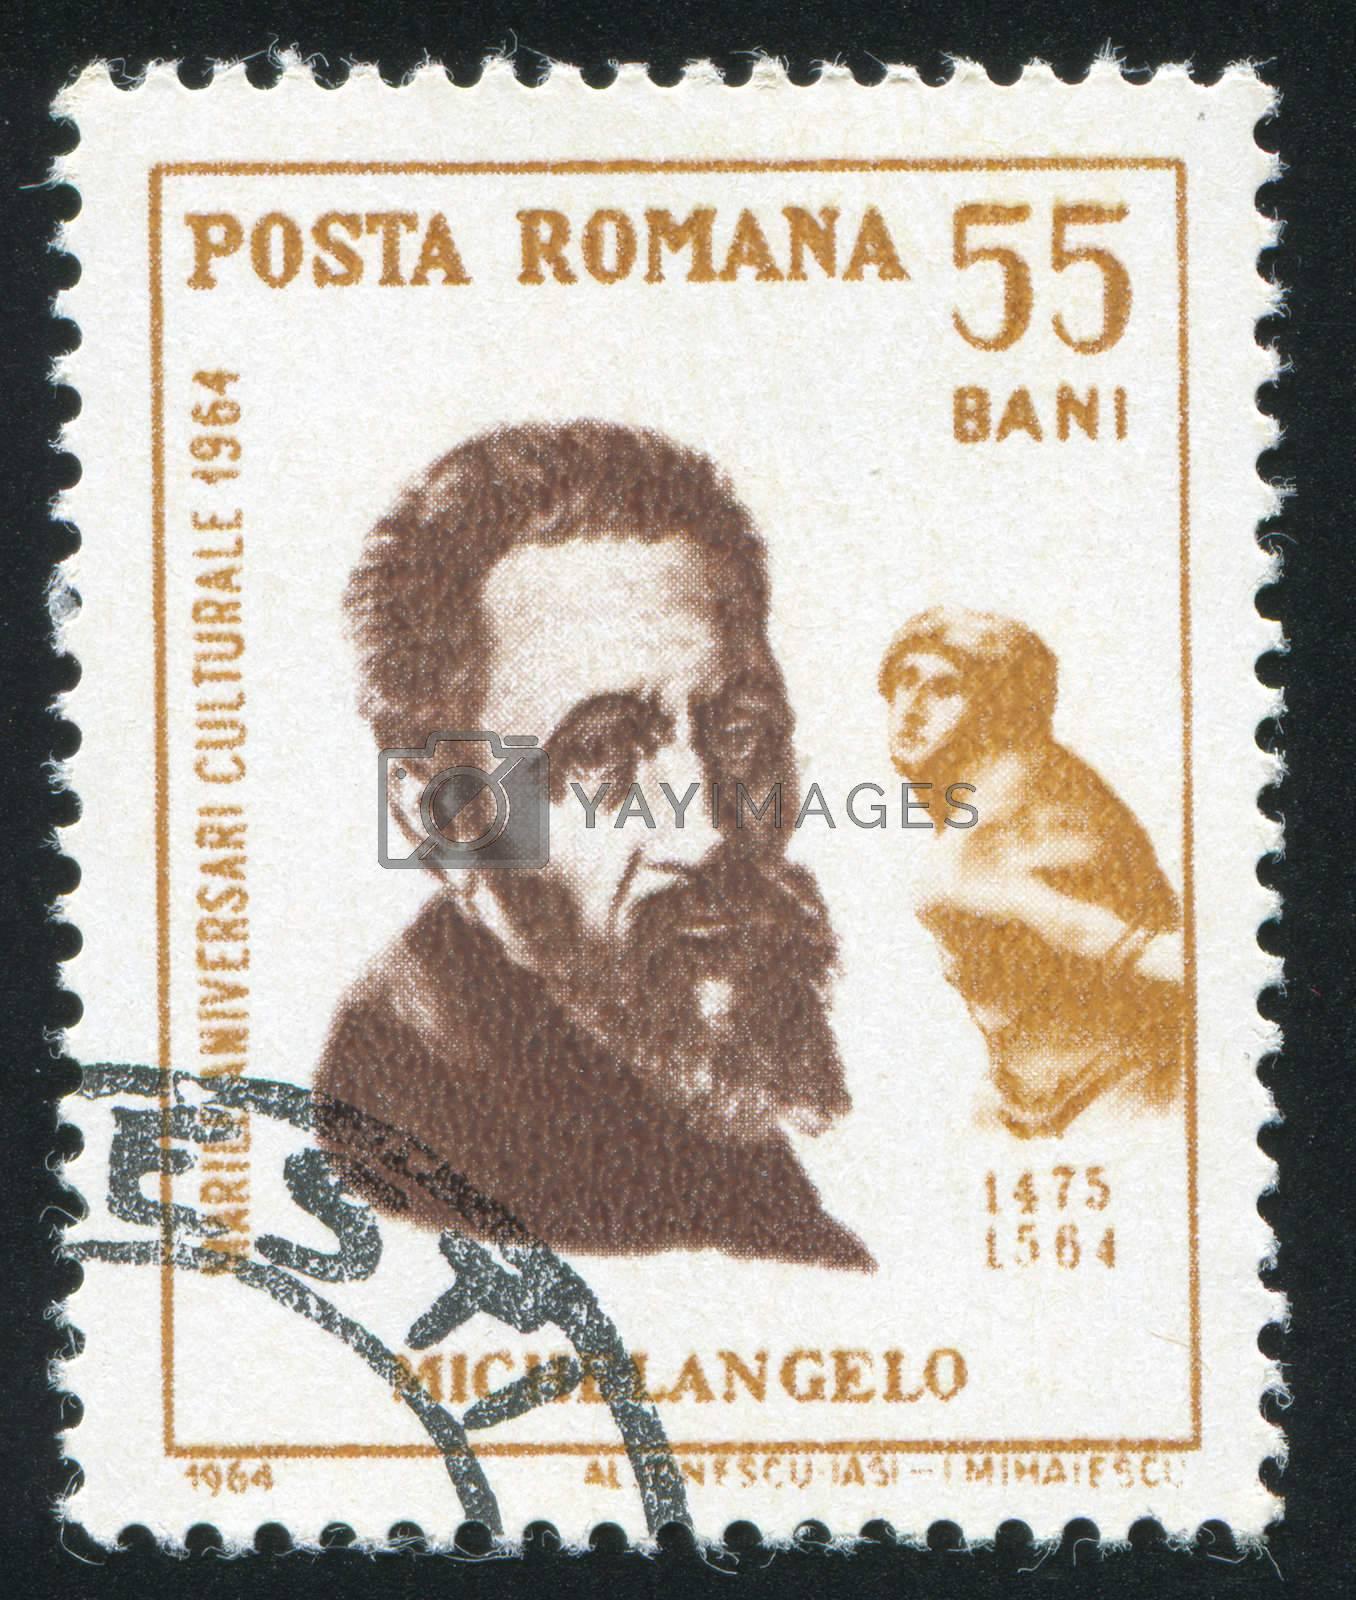 ROMANIA - CIRCA 1964: stamp printed by Romania, show Michelangelo, circa 1964.